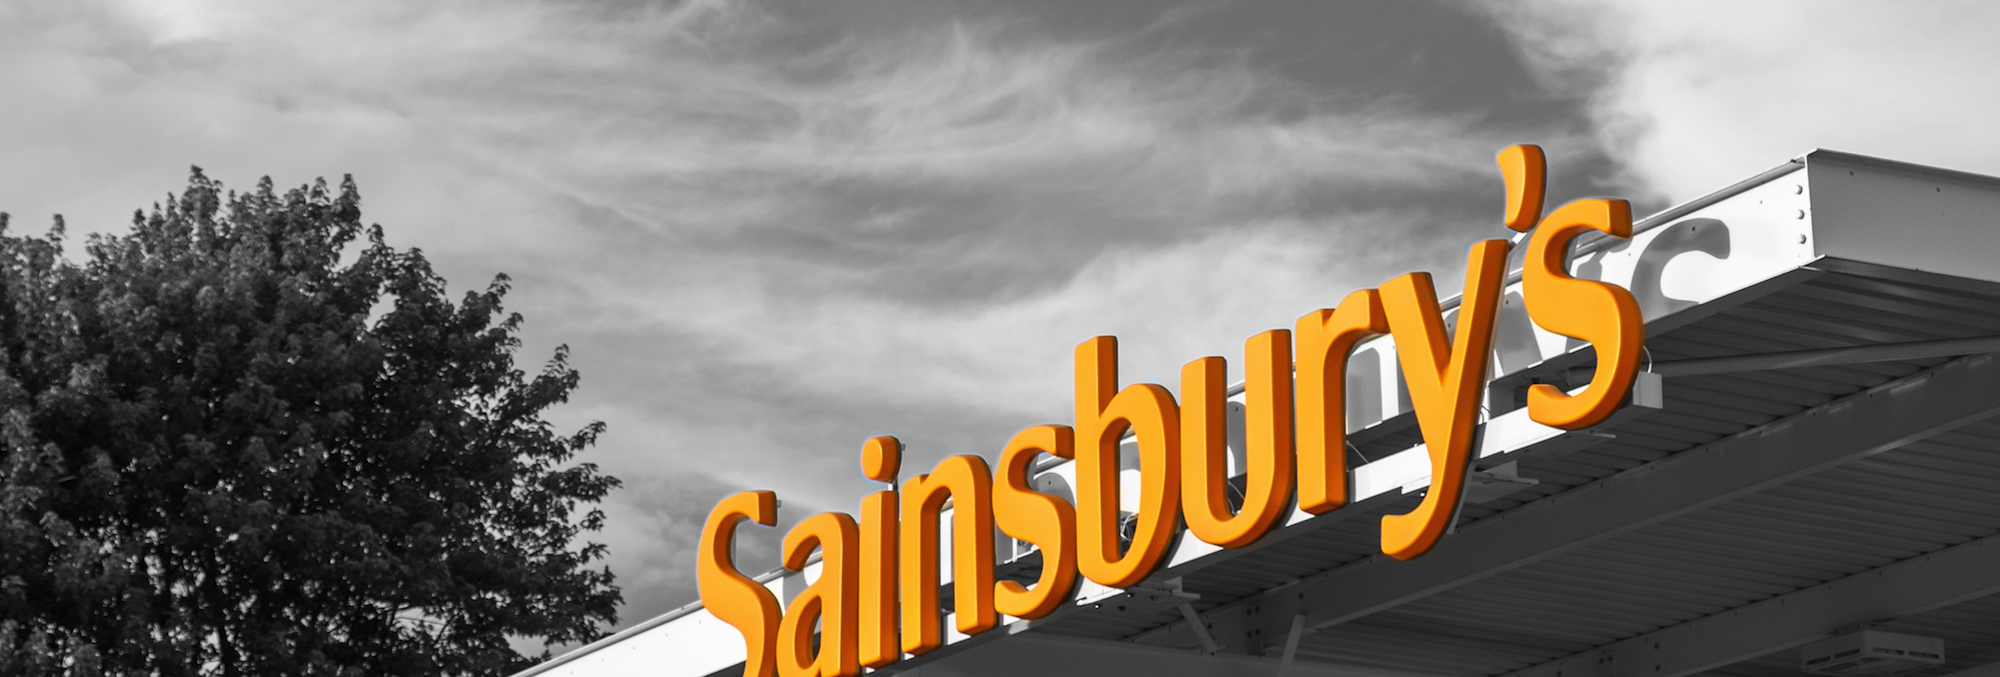 Sainsbury's image